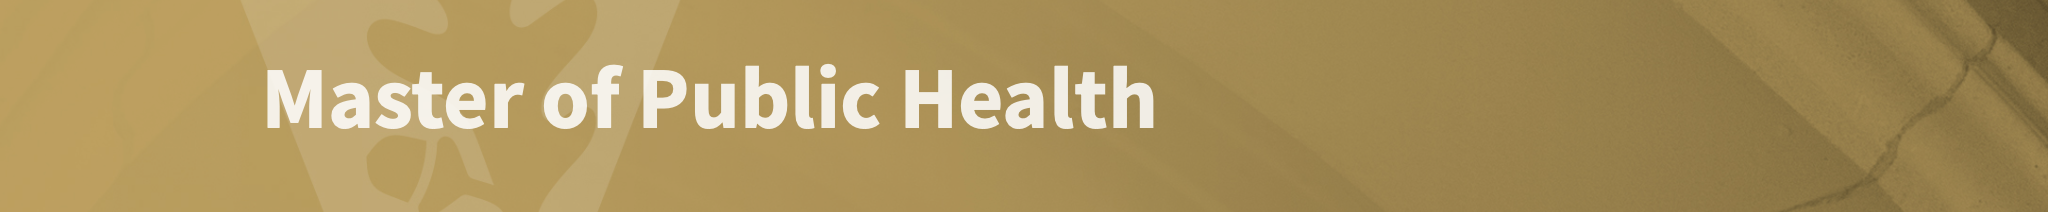 Masters of Public Health (MPH)